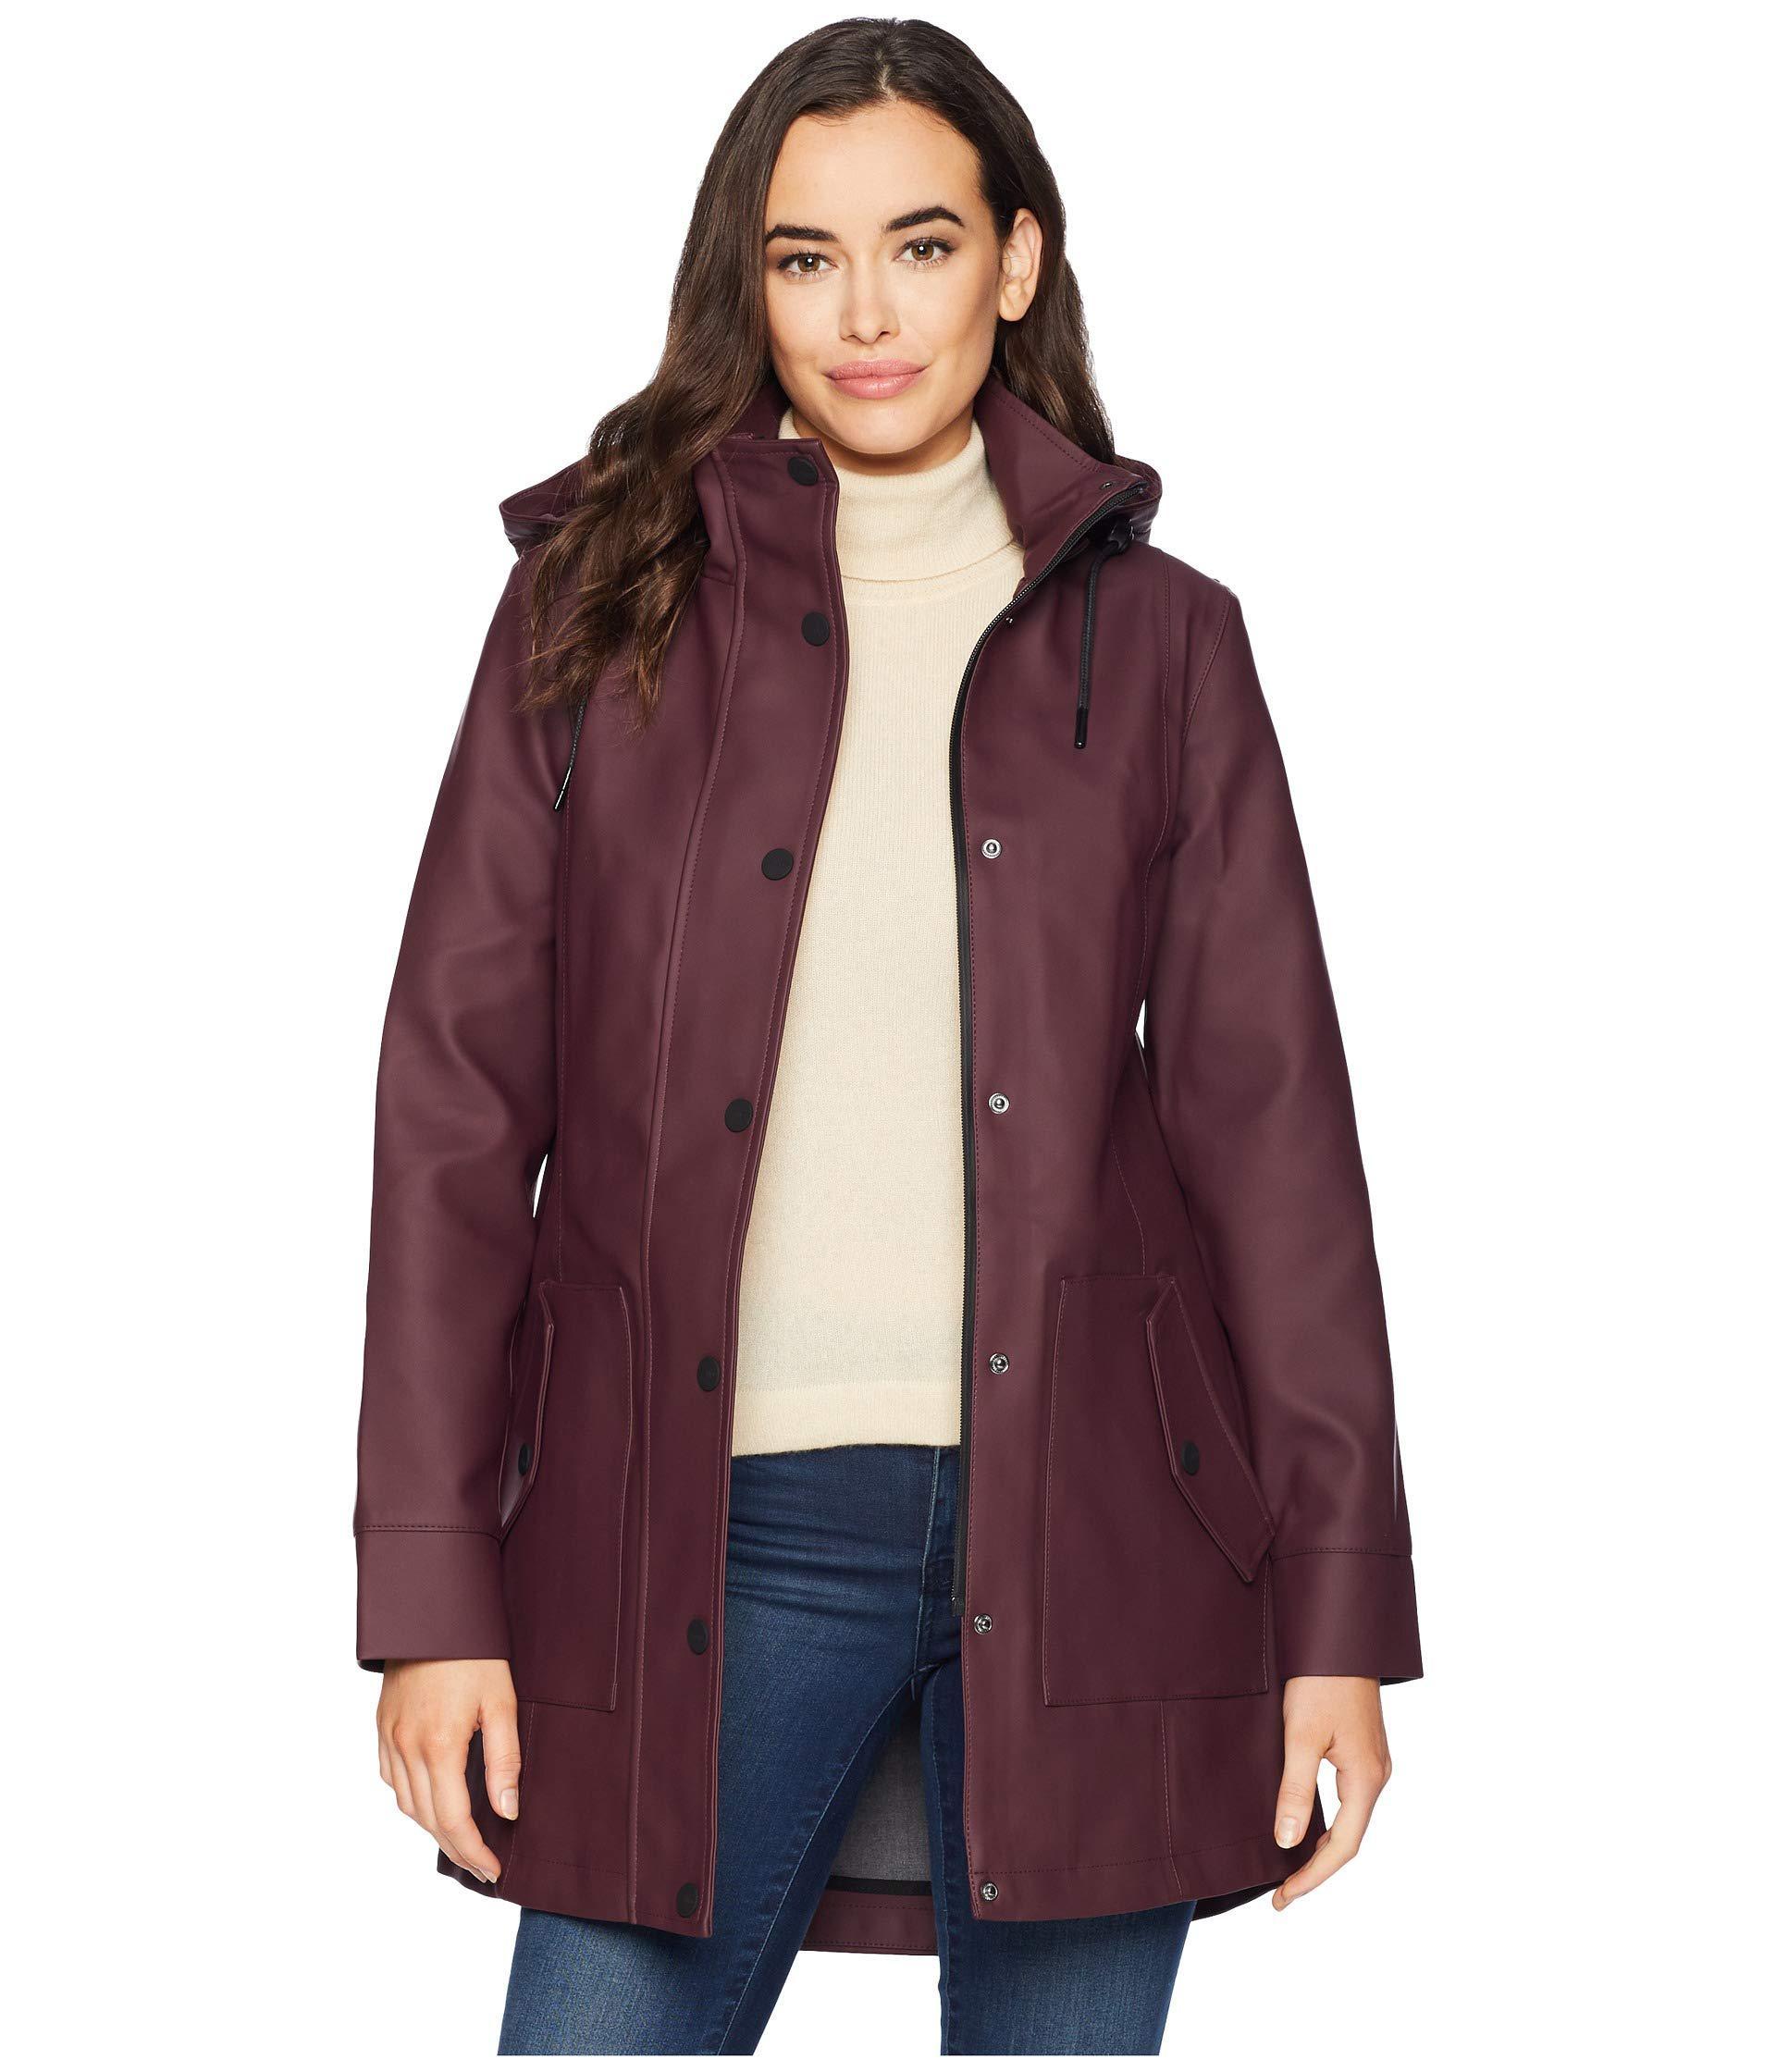 Lyst ugg rain jacket black women coat in purple ugg coats trench jpg  1920x2240 Ugg coats 48ee9f0ab